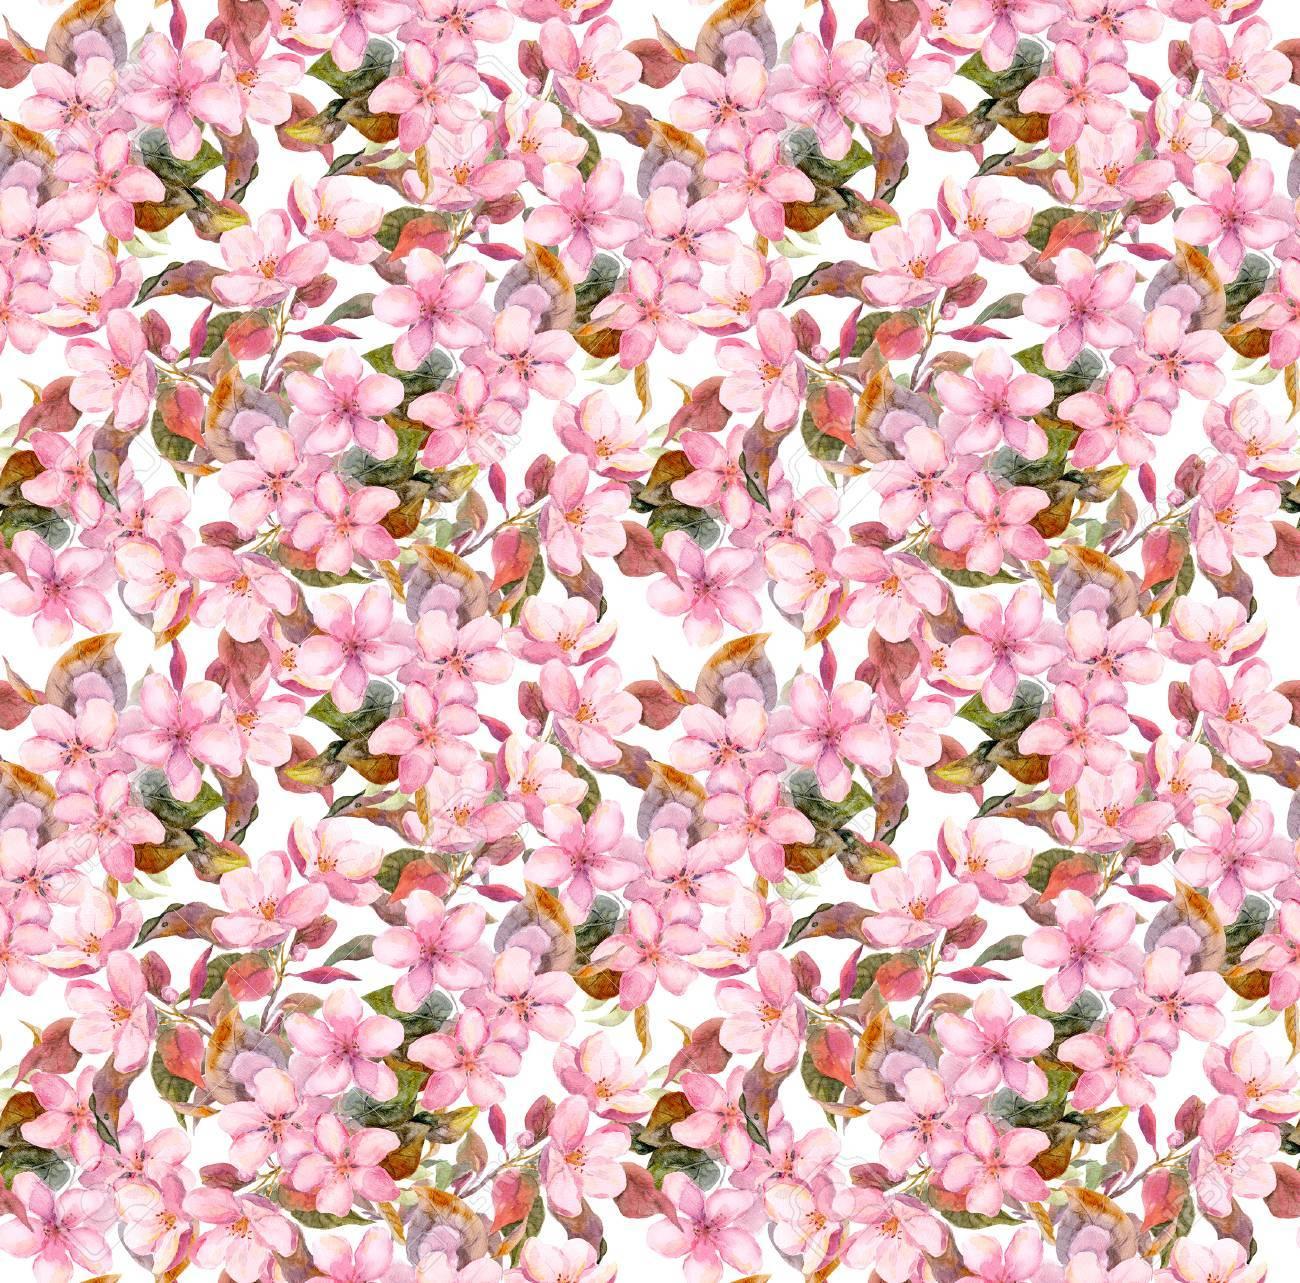 Immagini Stock Fioritura Fiori Rosa Seamless Vintage Motivo